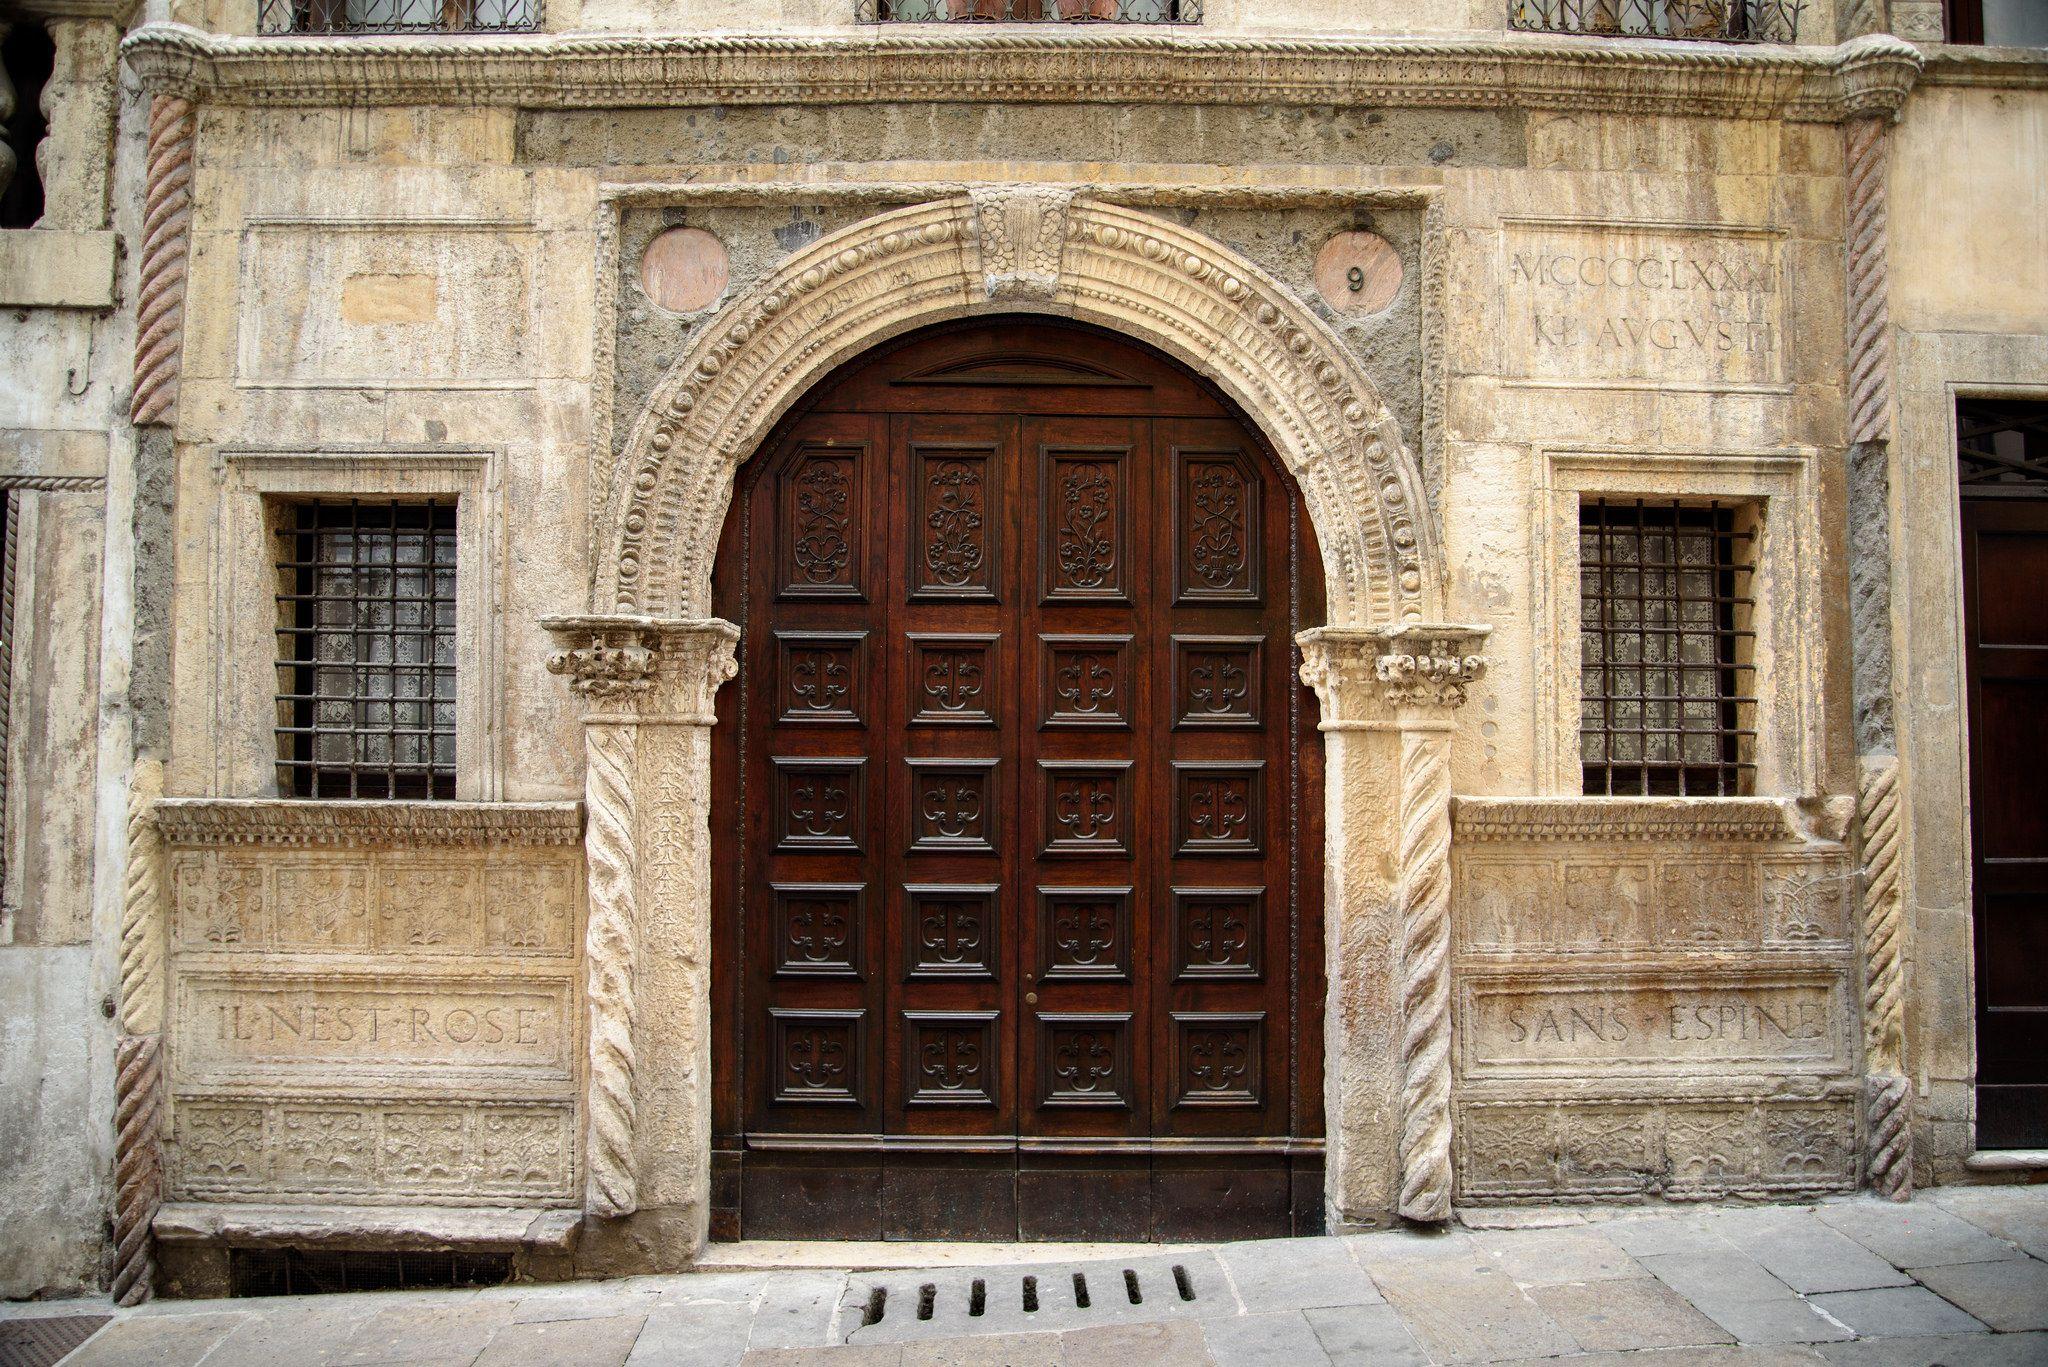 Vicenza - Casa Pigafetta | Vicenza | Italy culture, Italy